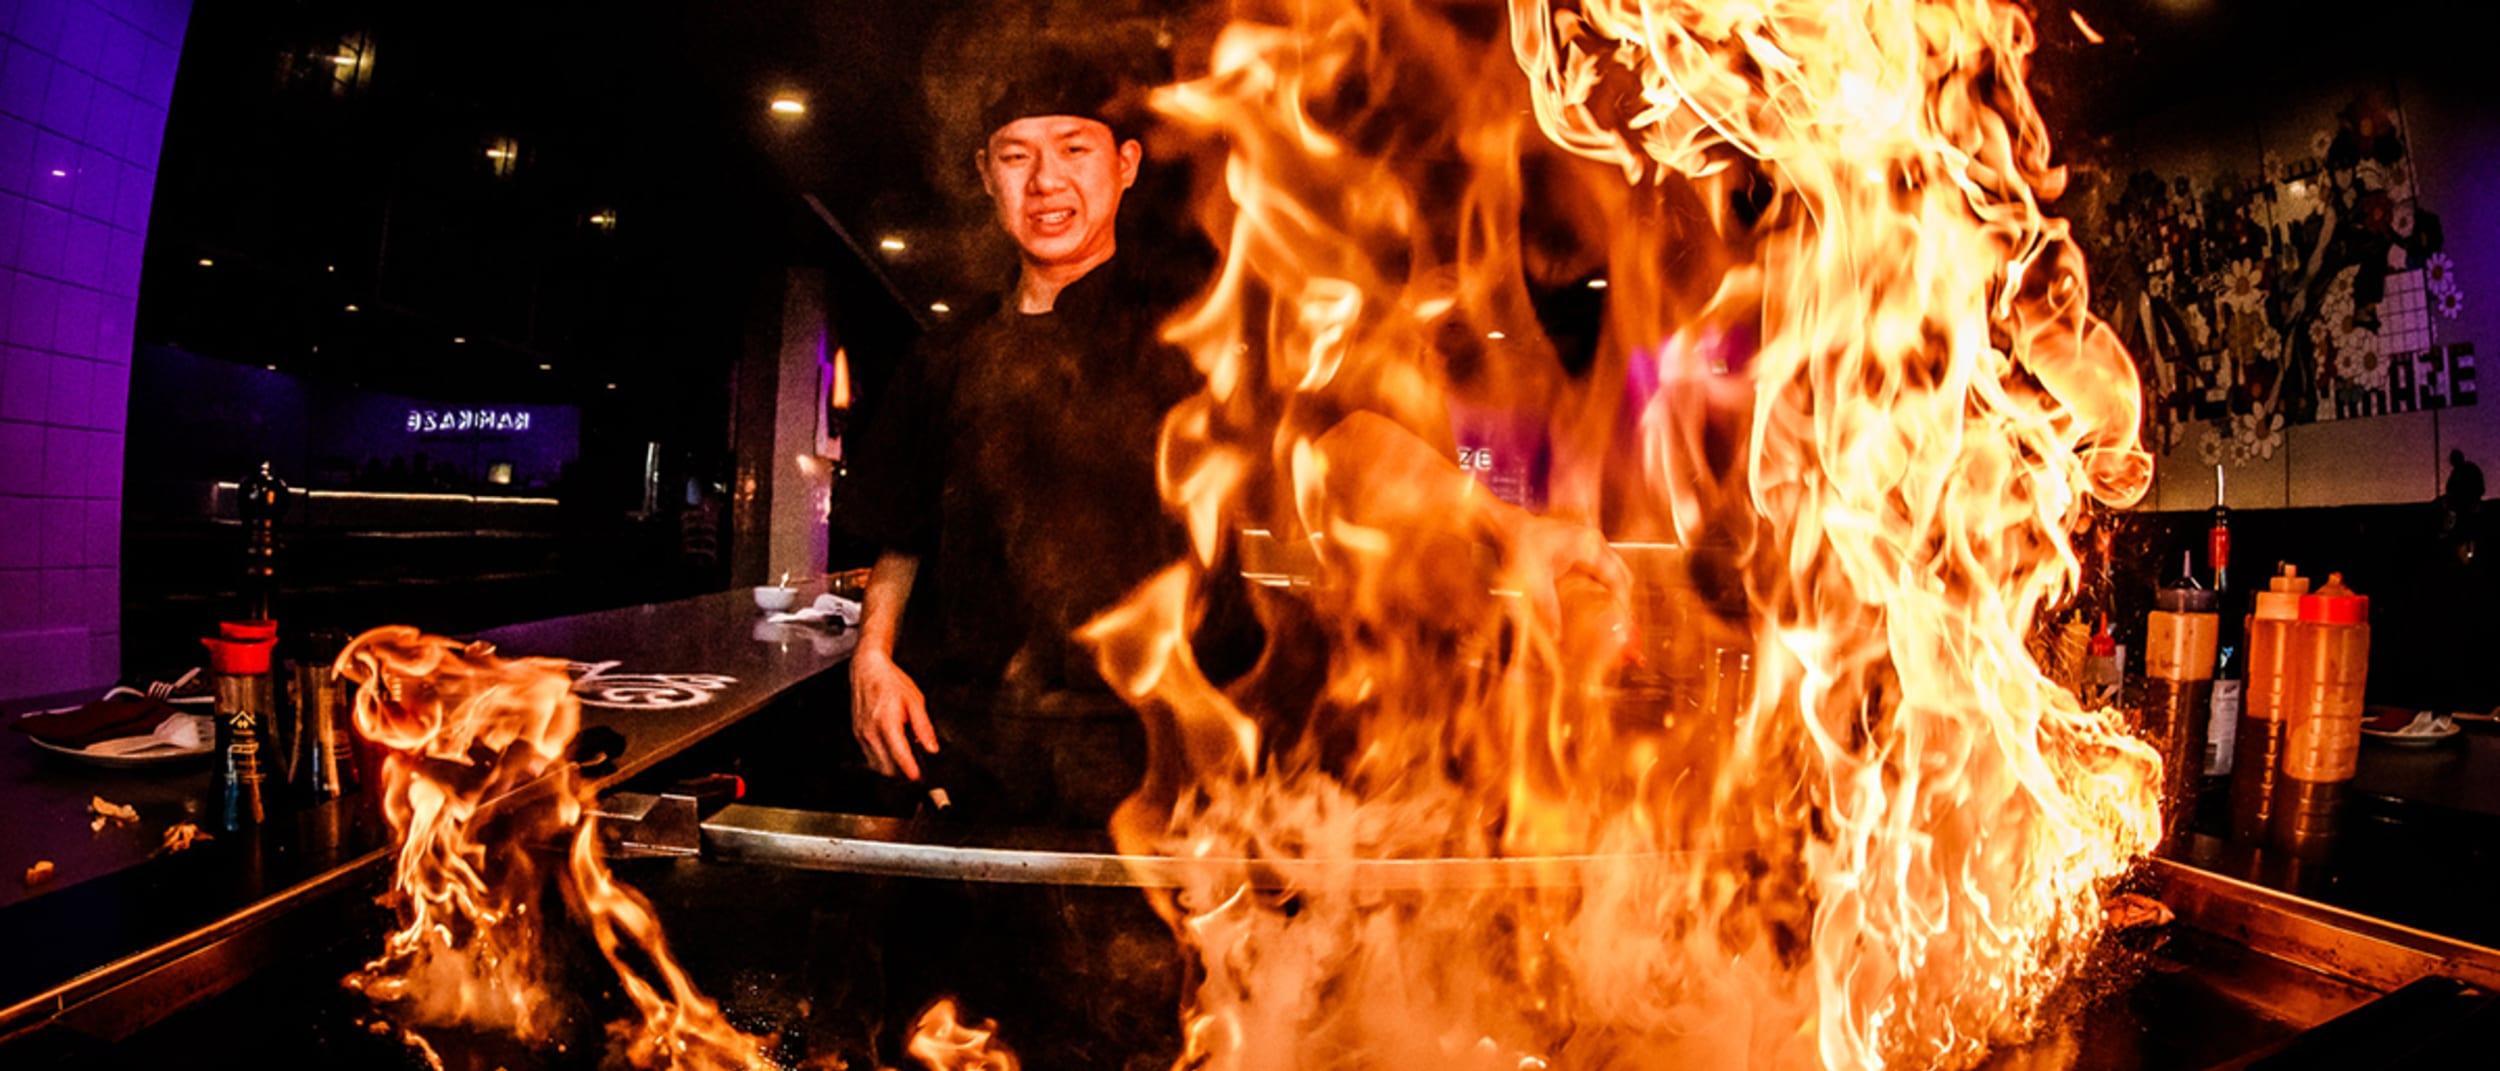 5 minutes with the head chef of Kamikaze Teppanyaki